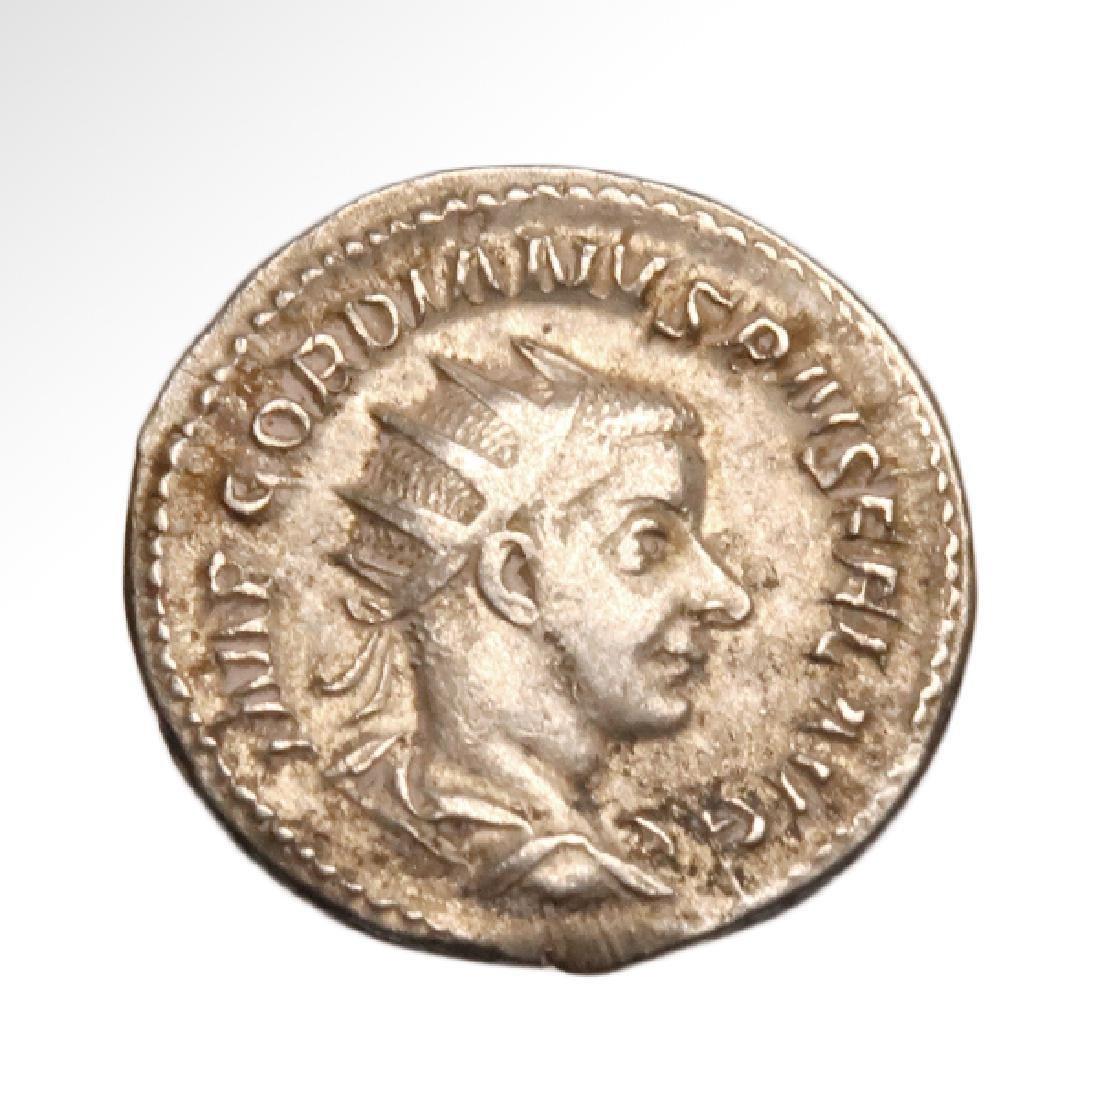 Emperor Gordianus III Coin, Struck A.D. 240-244, Rome